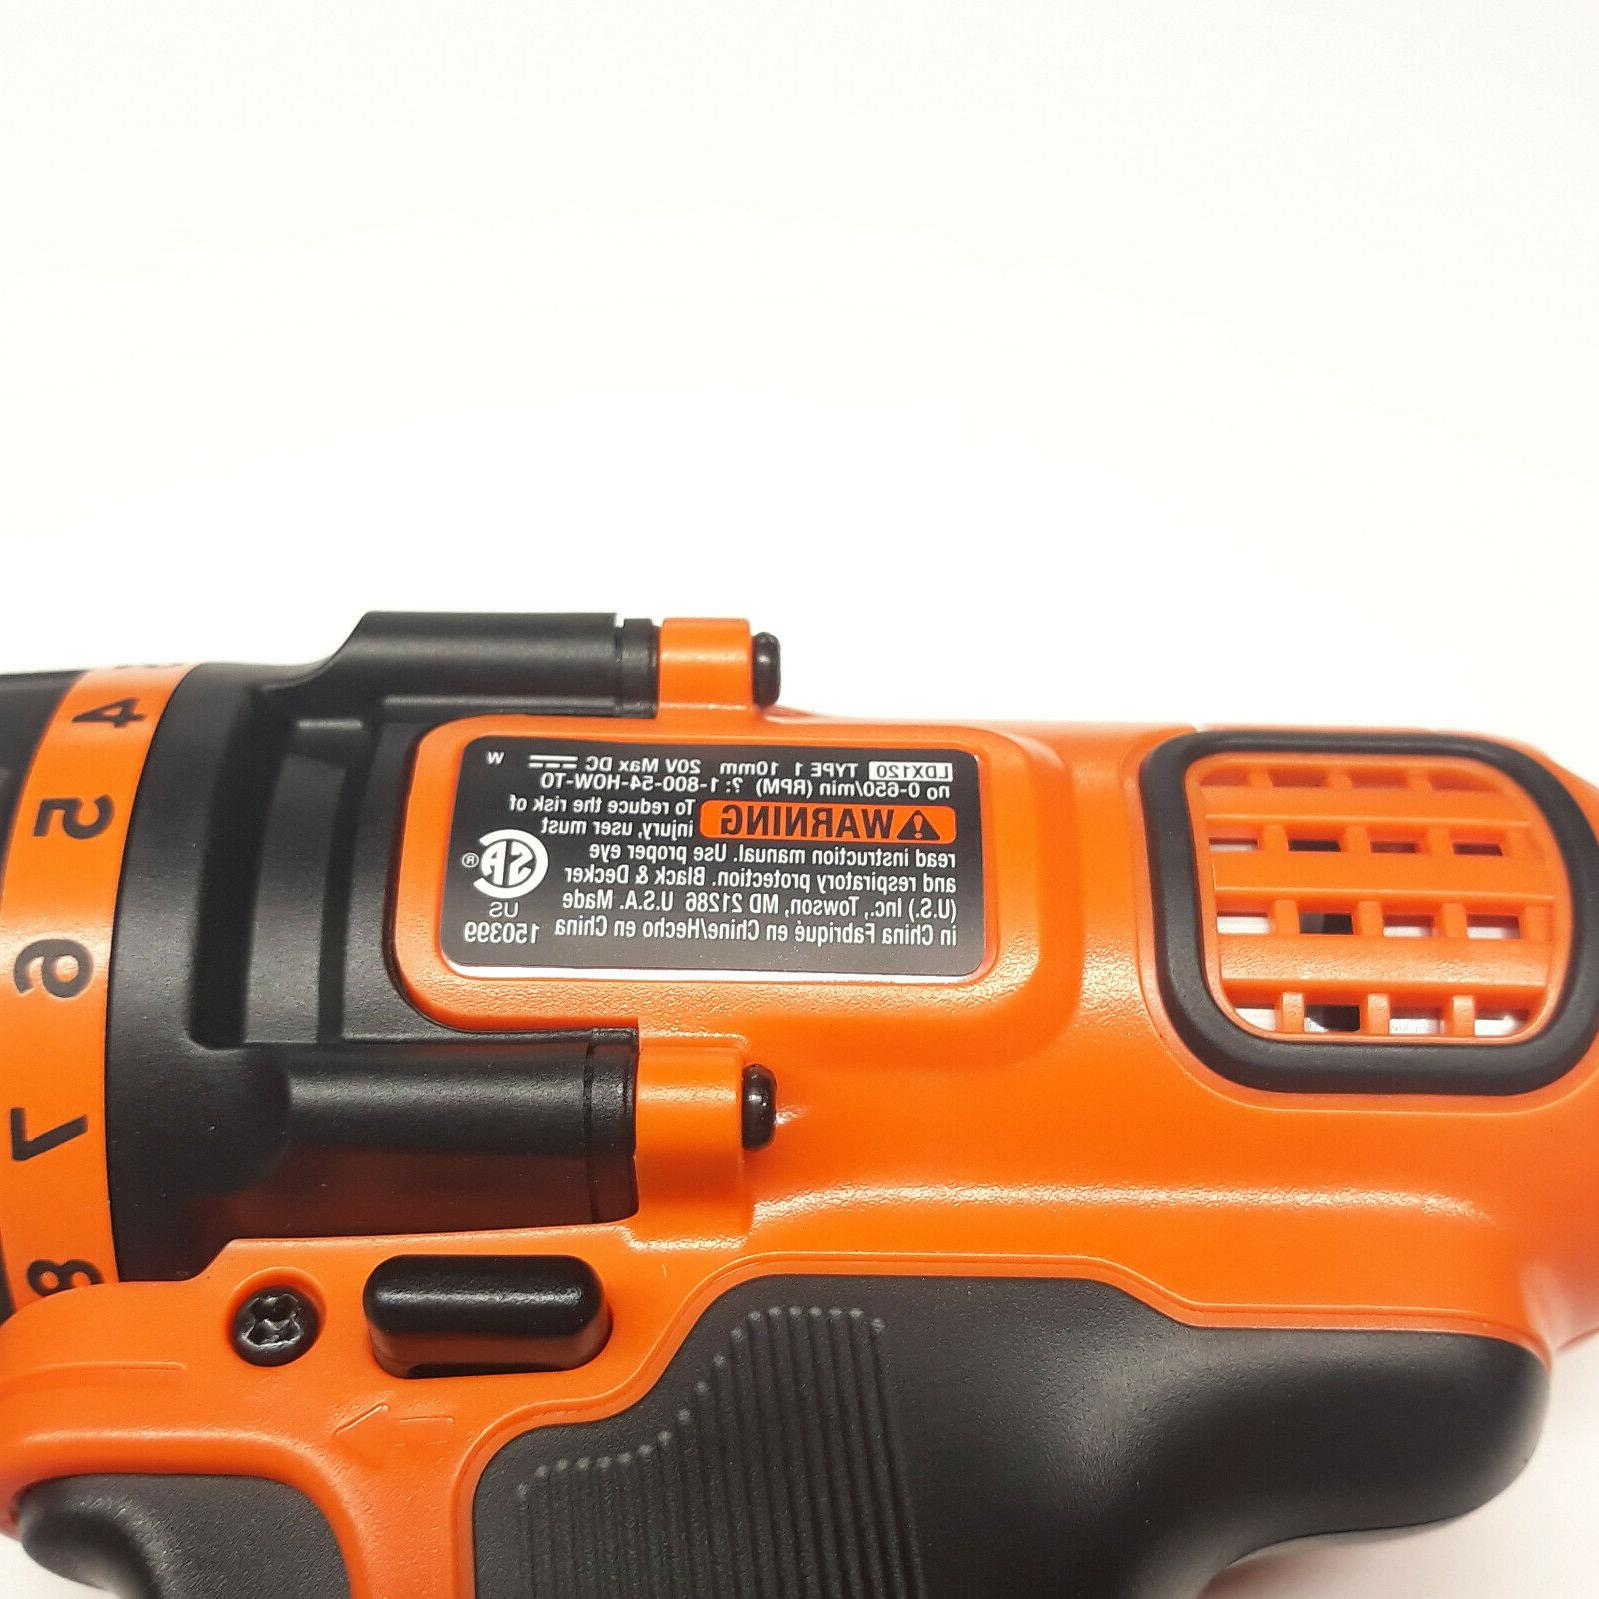 Black Decker Max Lithium LDX120 Cordless Drill / Driver